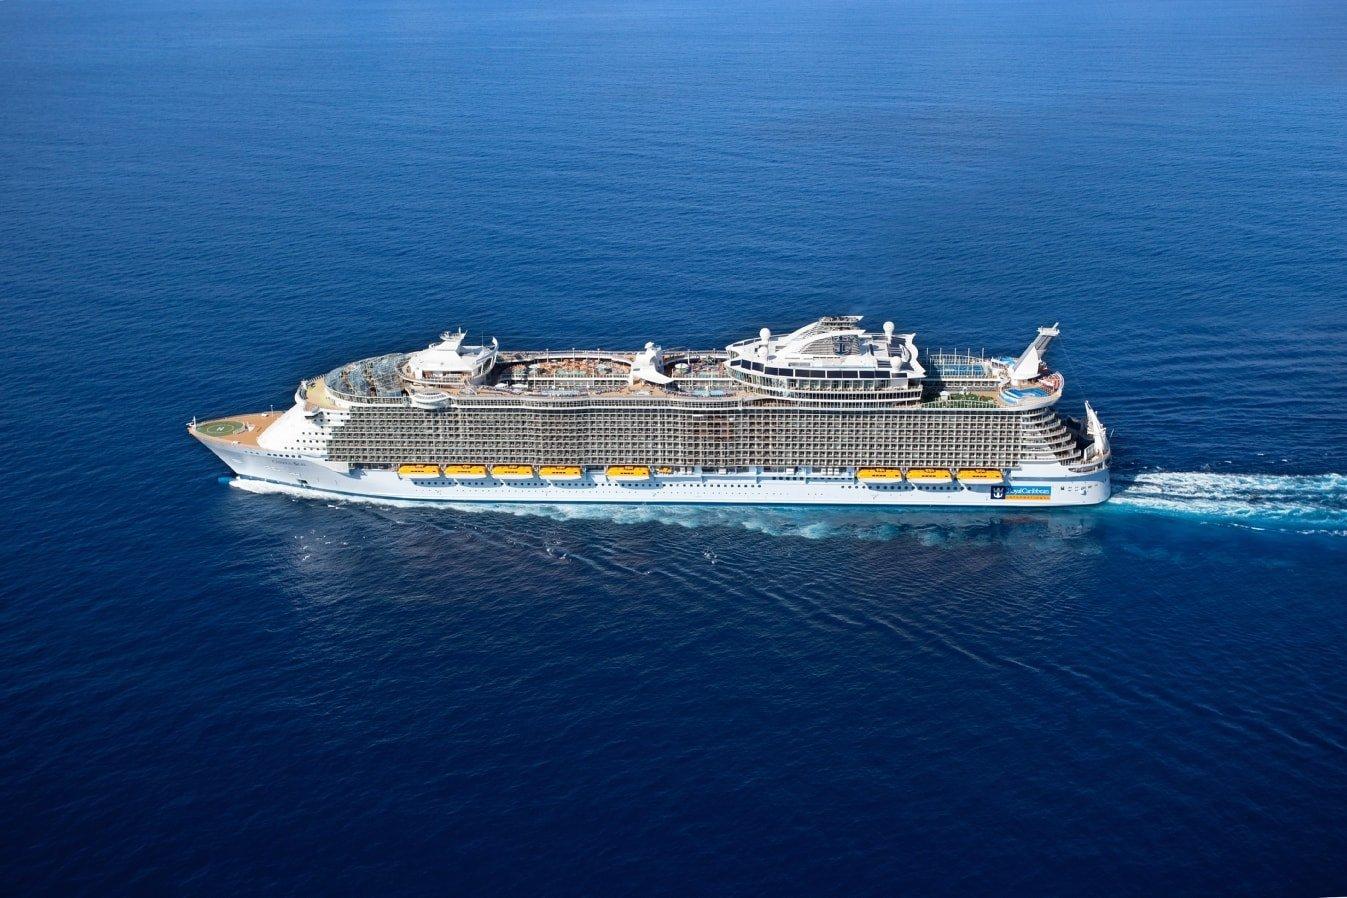 Royal Caribbean Announces 2018 2019 Caribbean Alaska And Northeast Itineraries Royal